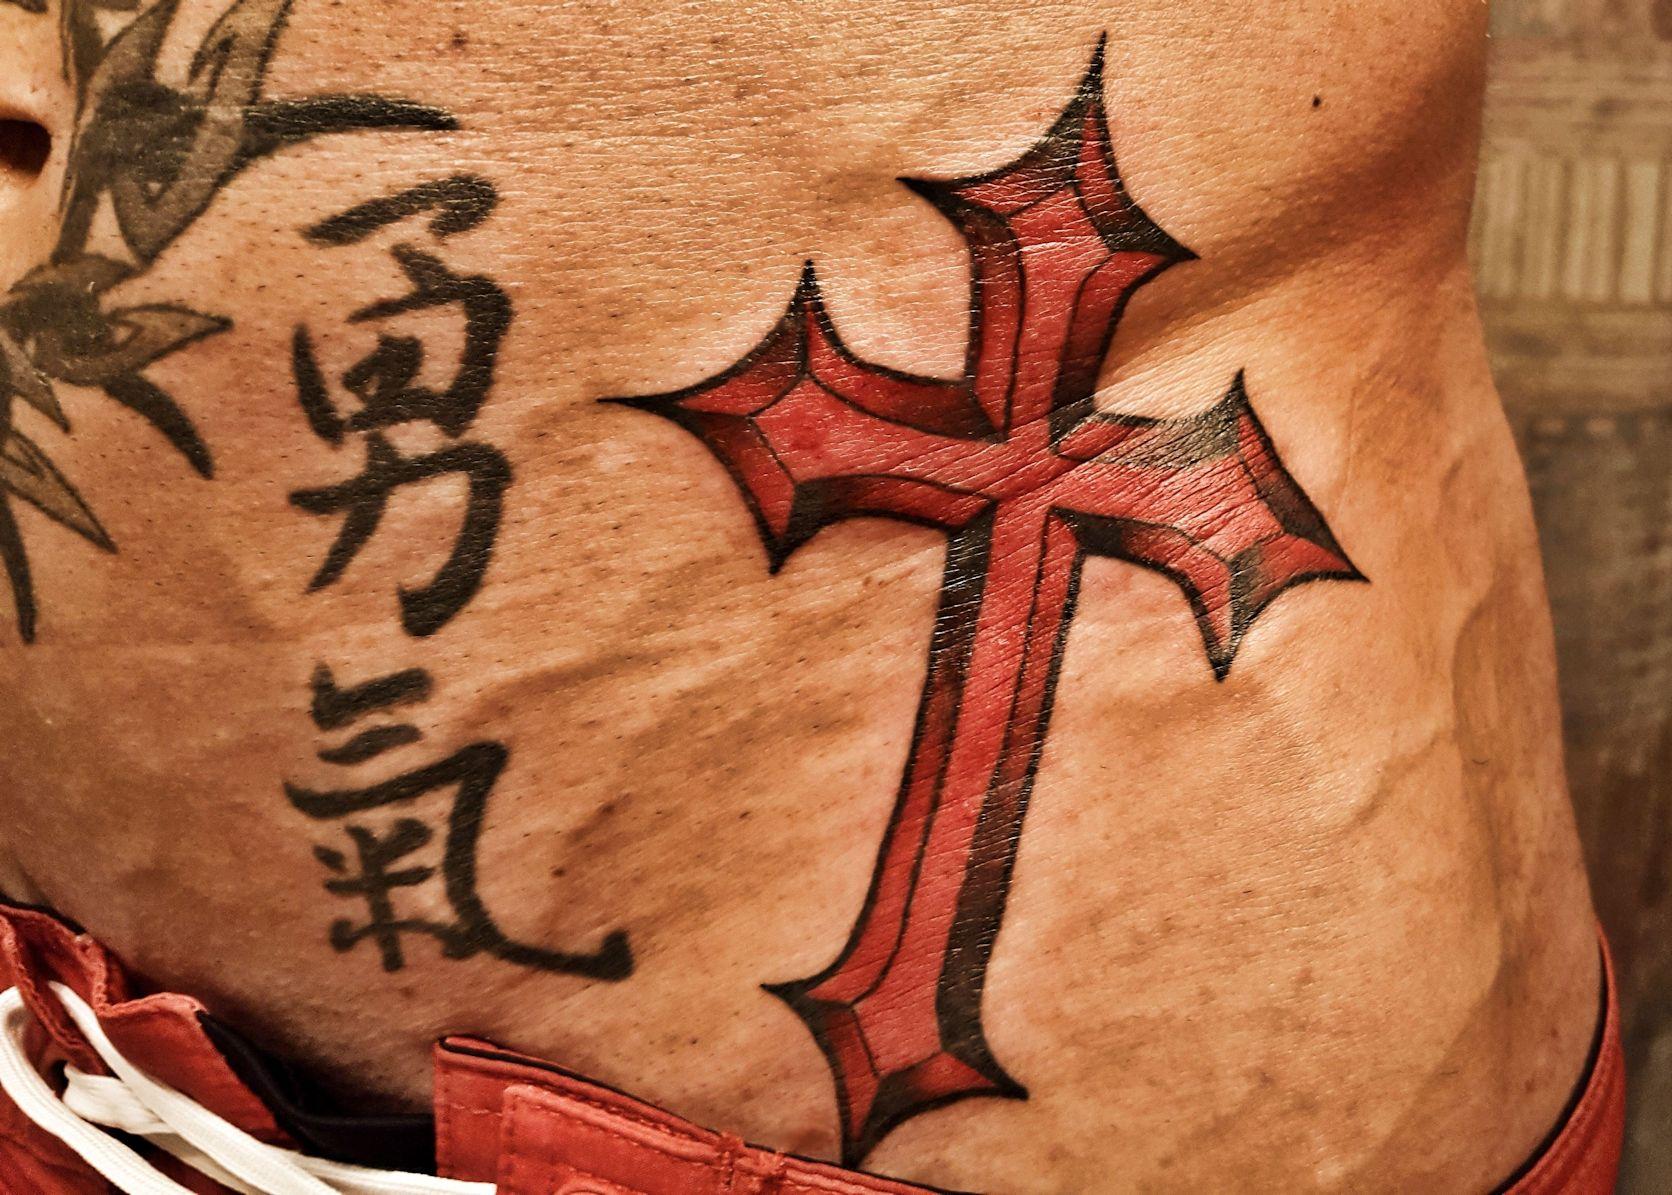 John Joseph Quinlan Physique Model Actor Cross Tattoo by Jon Saulnier #JohnQuinlan